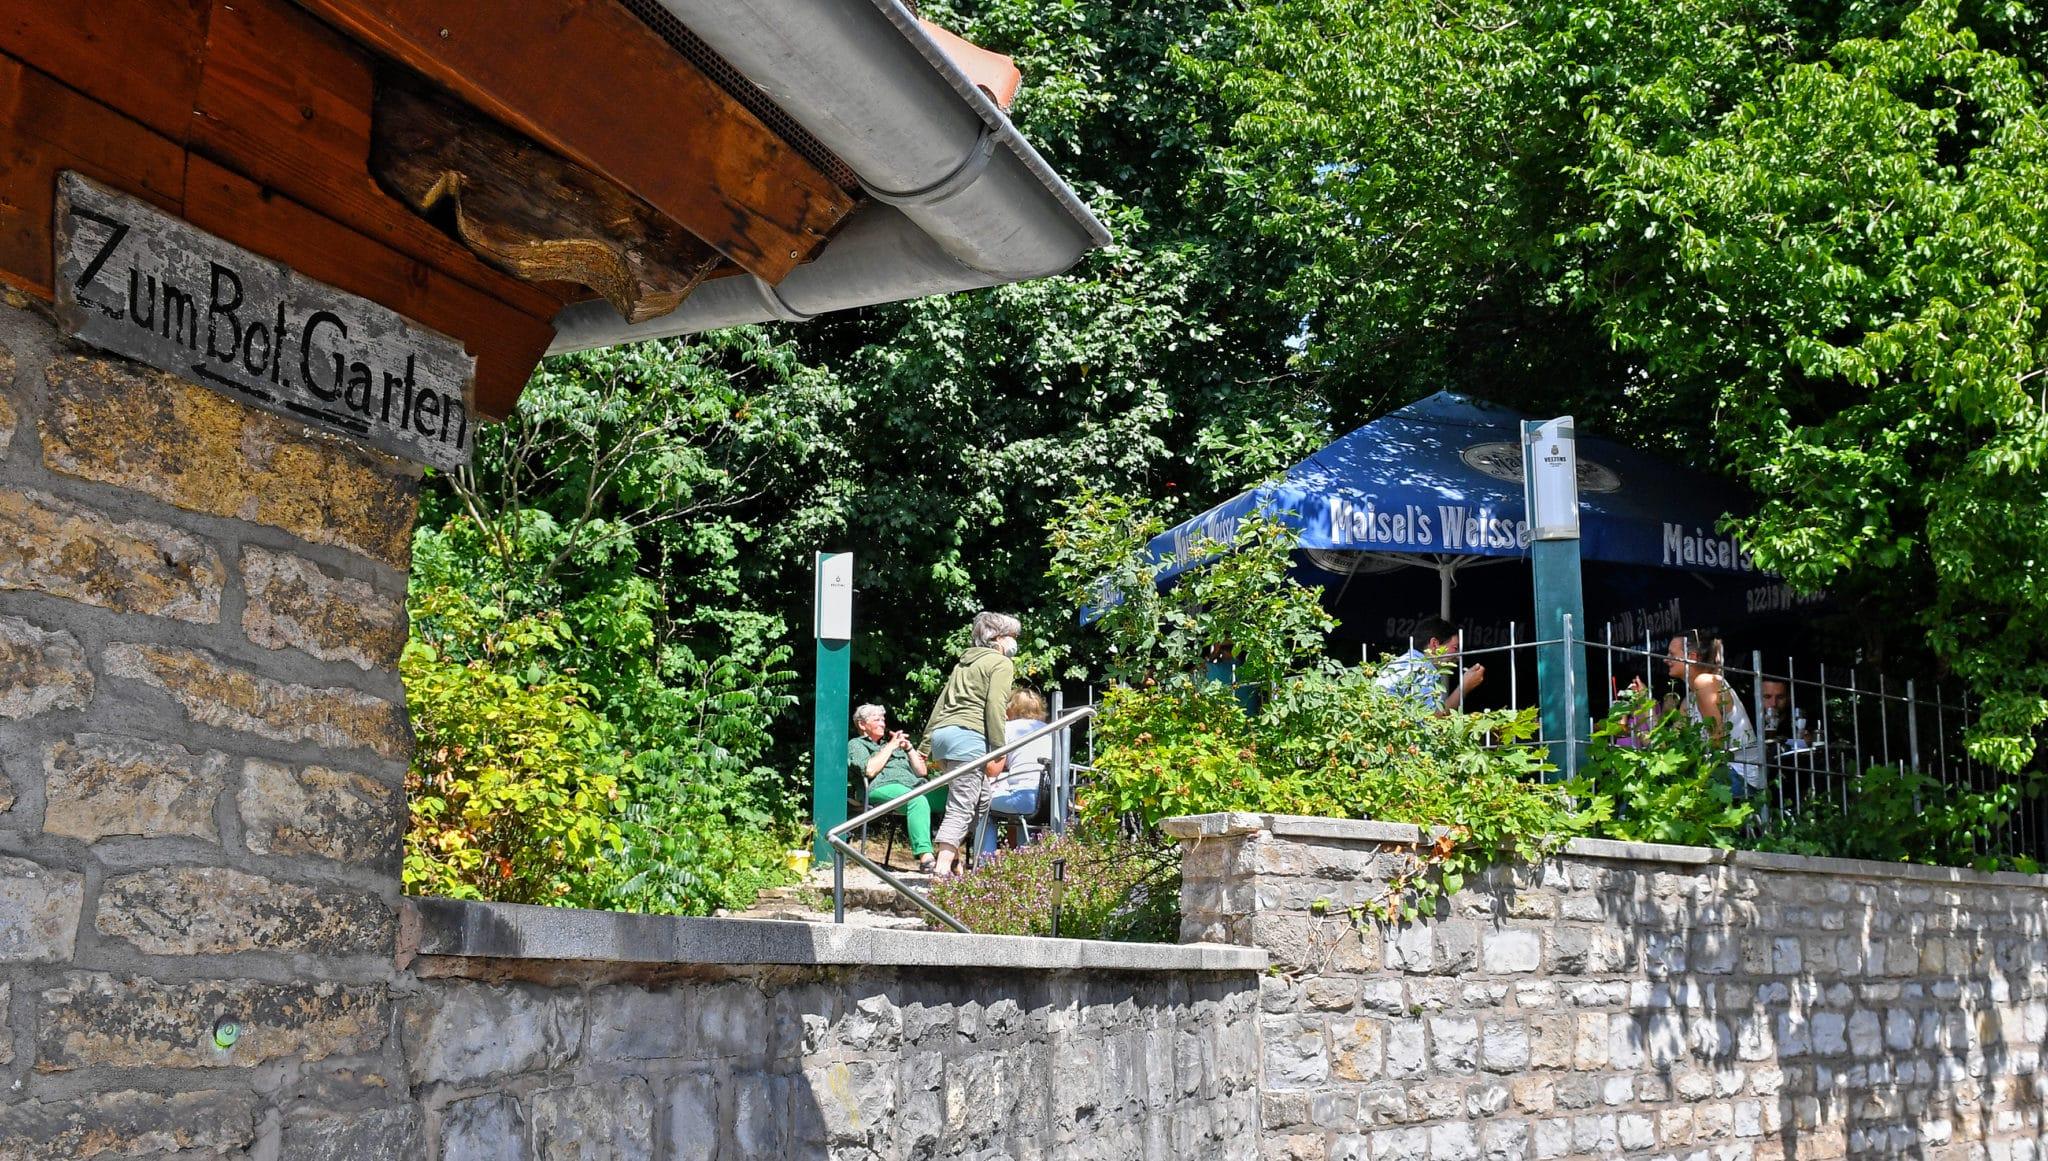 abseits-des-trubels-idyllische-lokale-in-goettingen